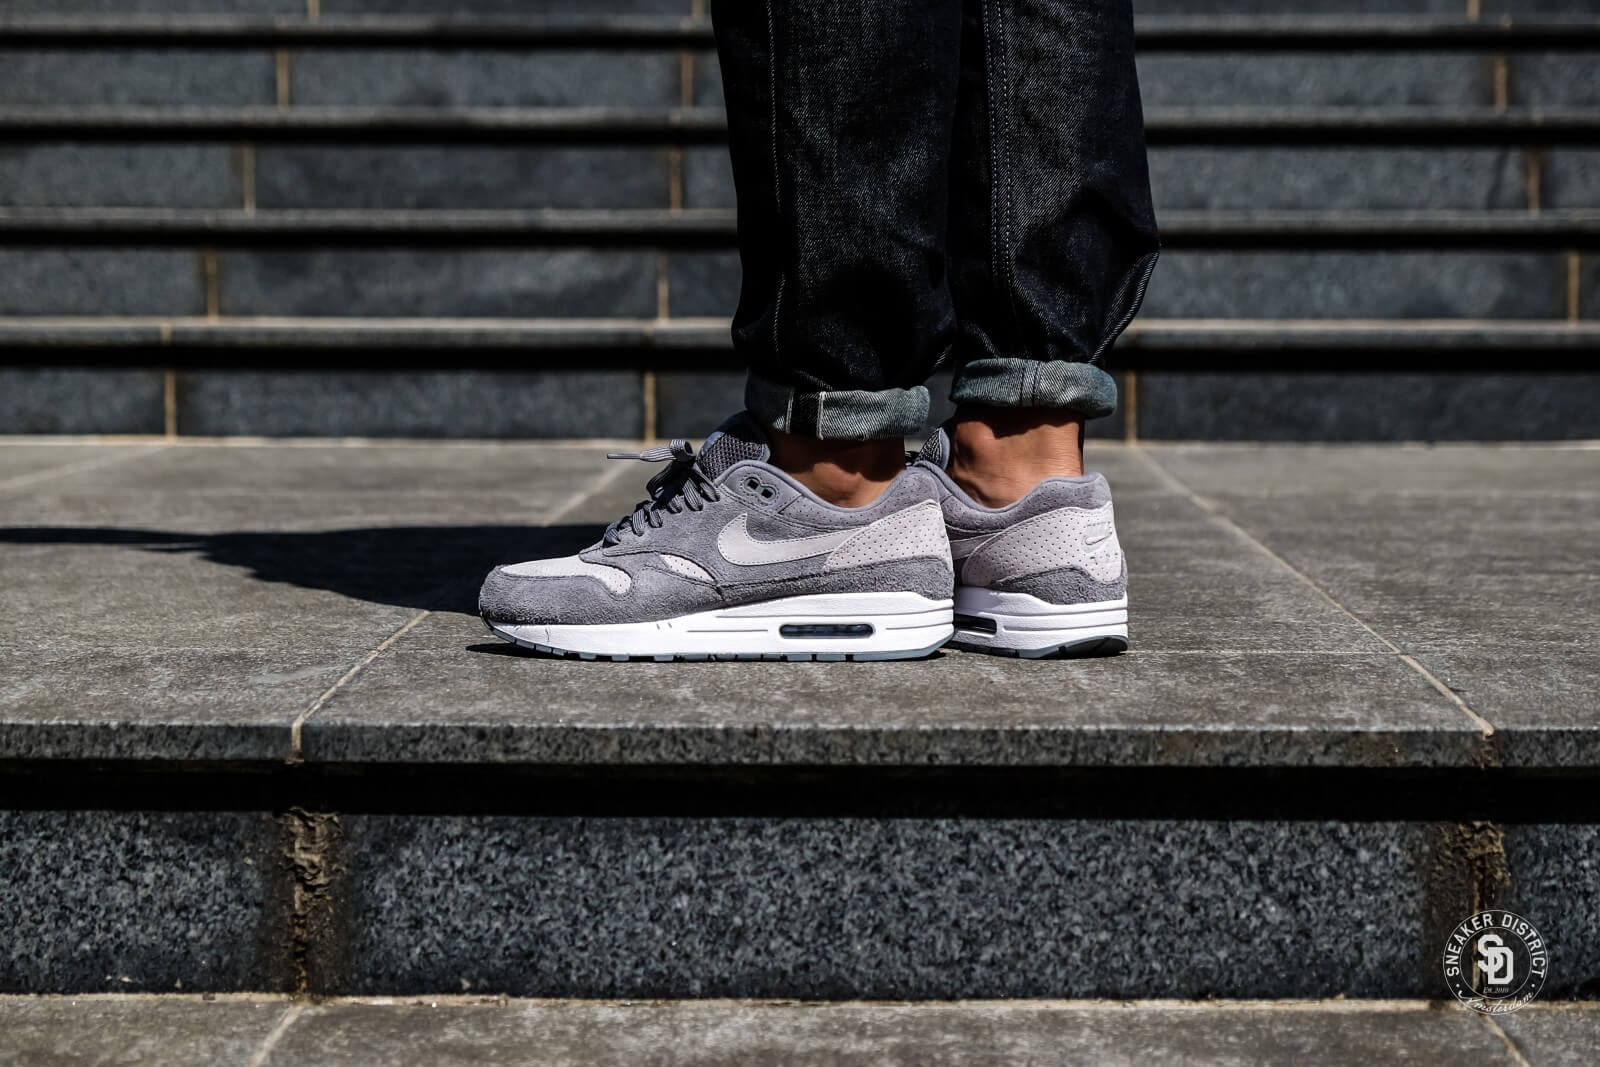 Nike Air Max 1 Premium Cool GreyWolf Grey 875844 005